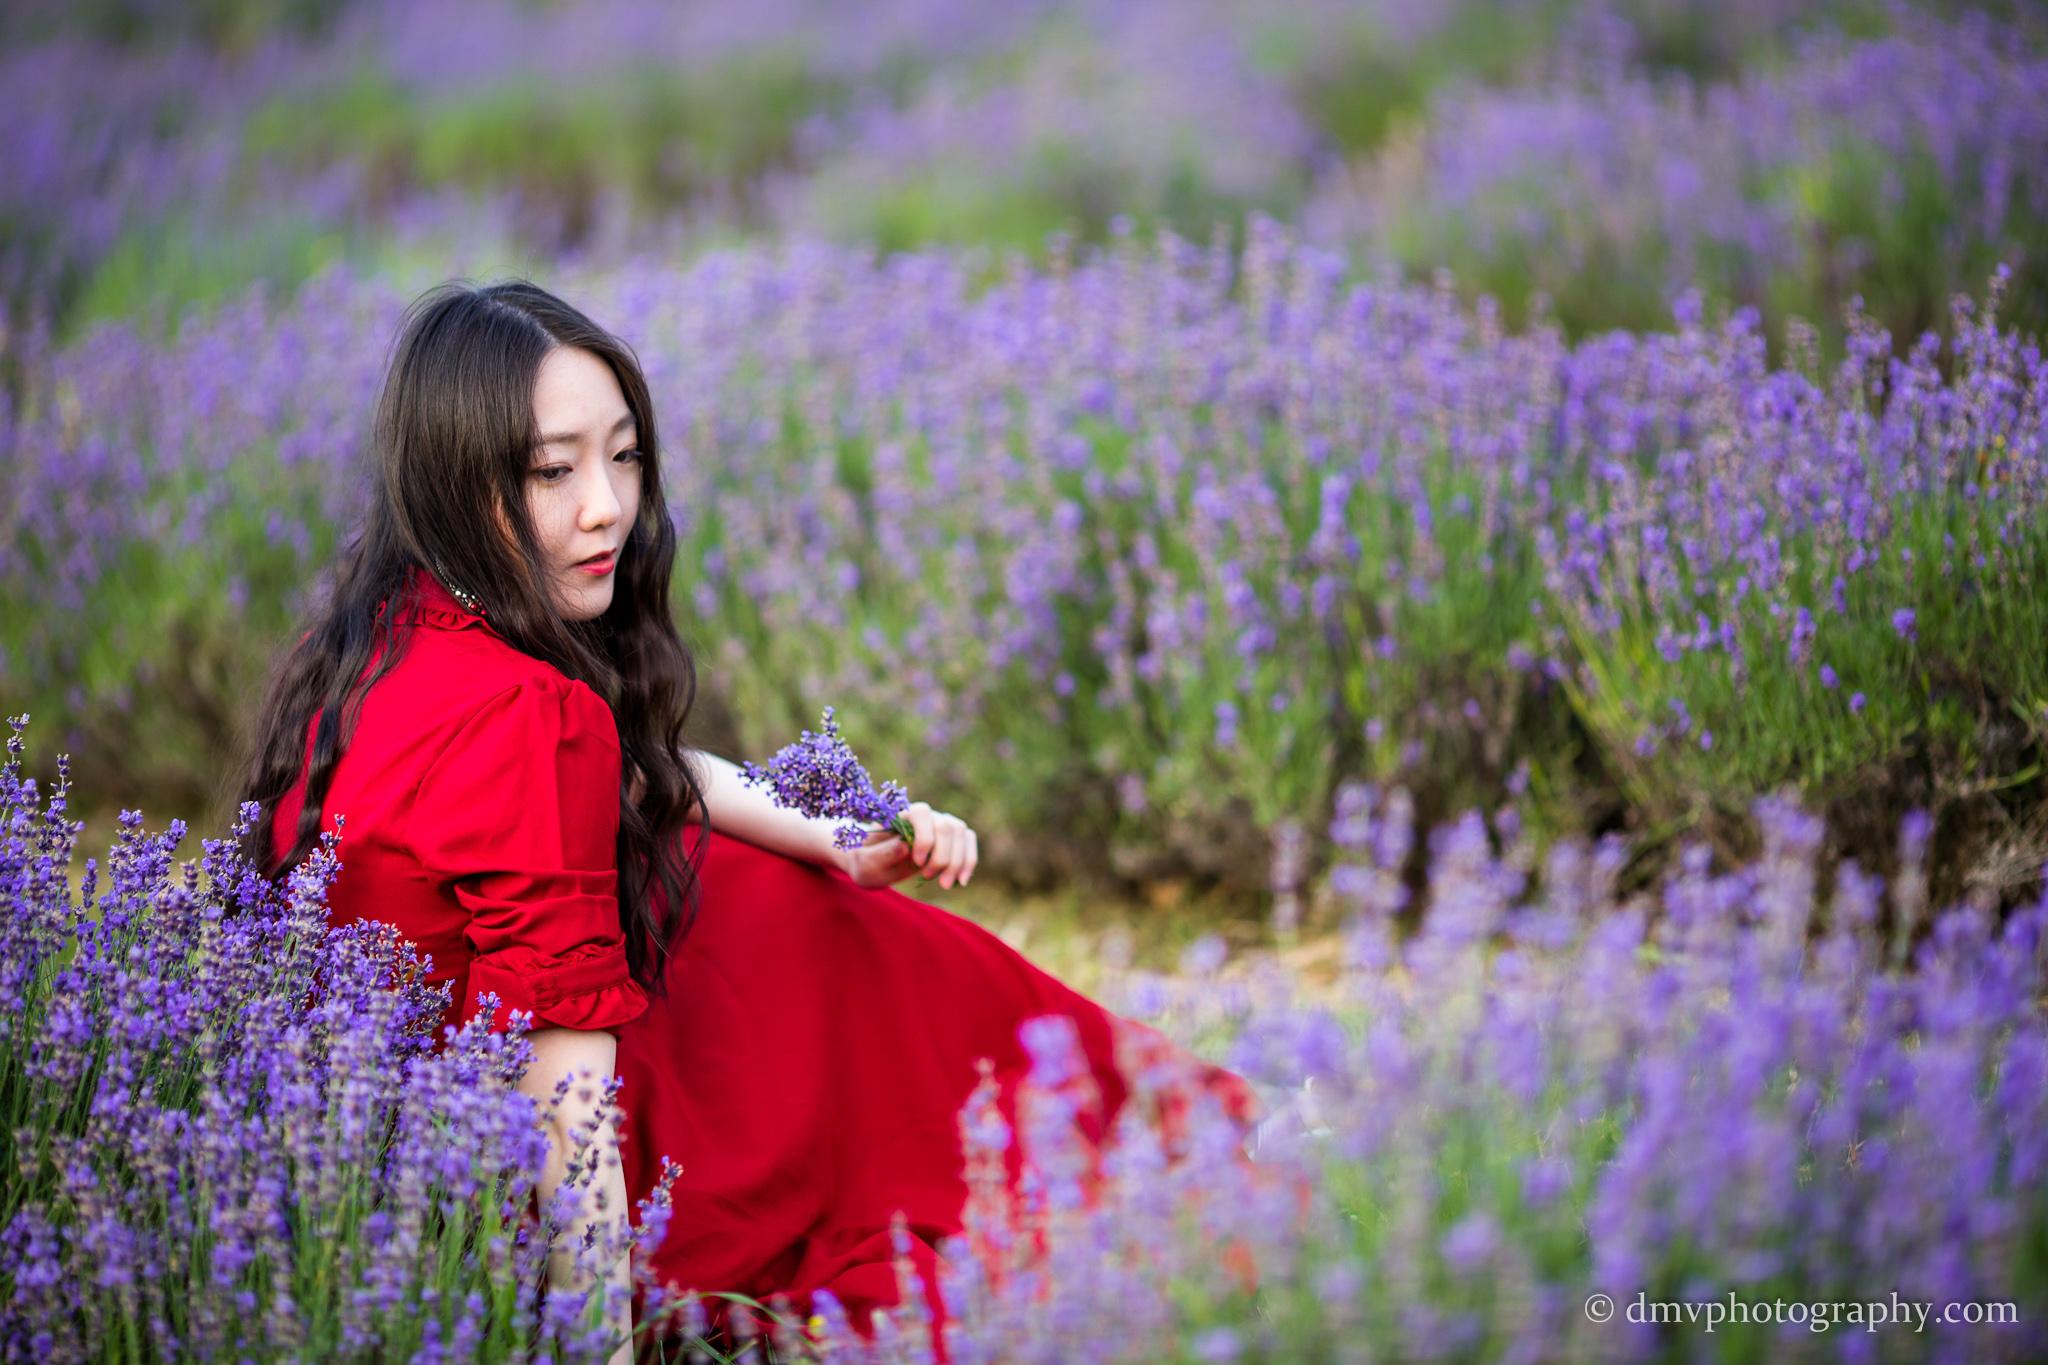 2016-06-24 - Zhu Xing - Lavender Field - 00050